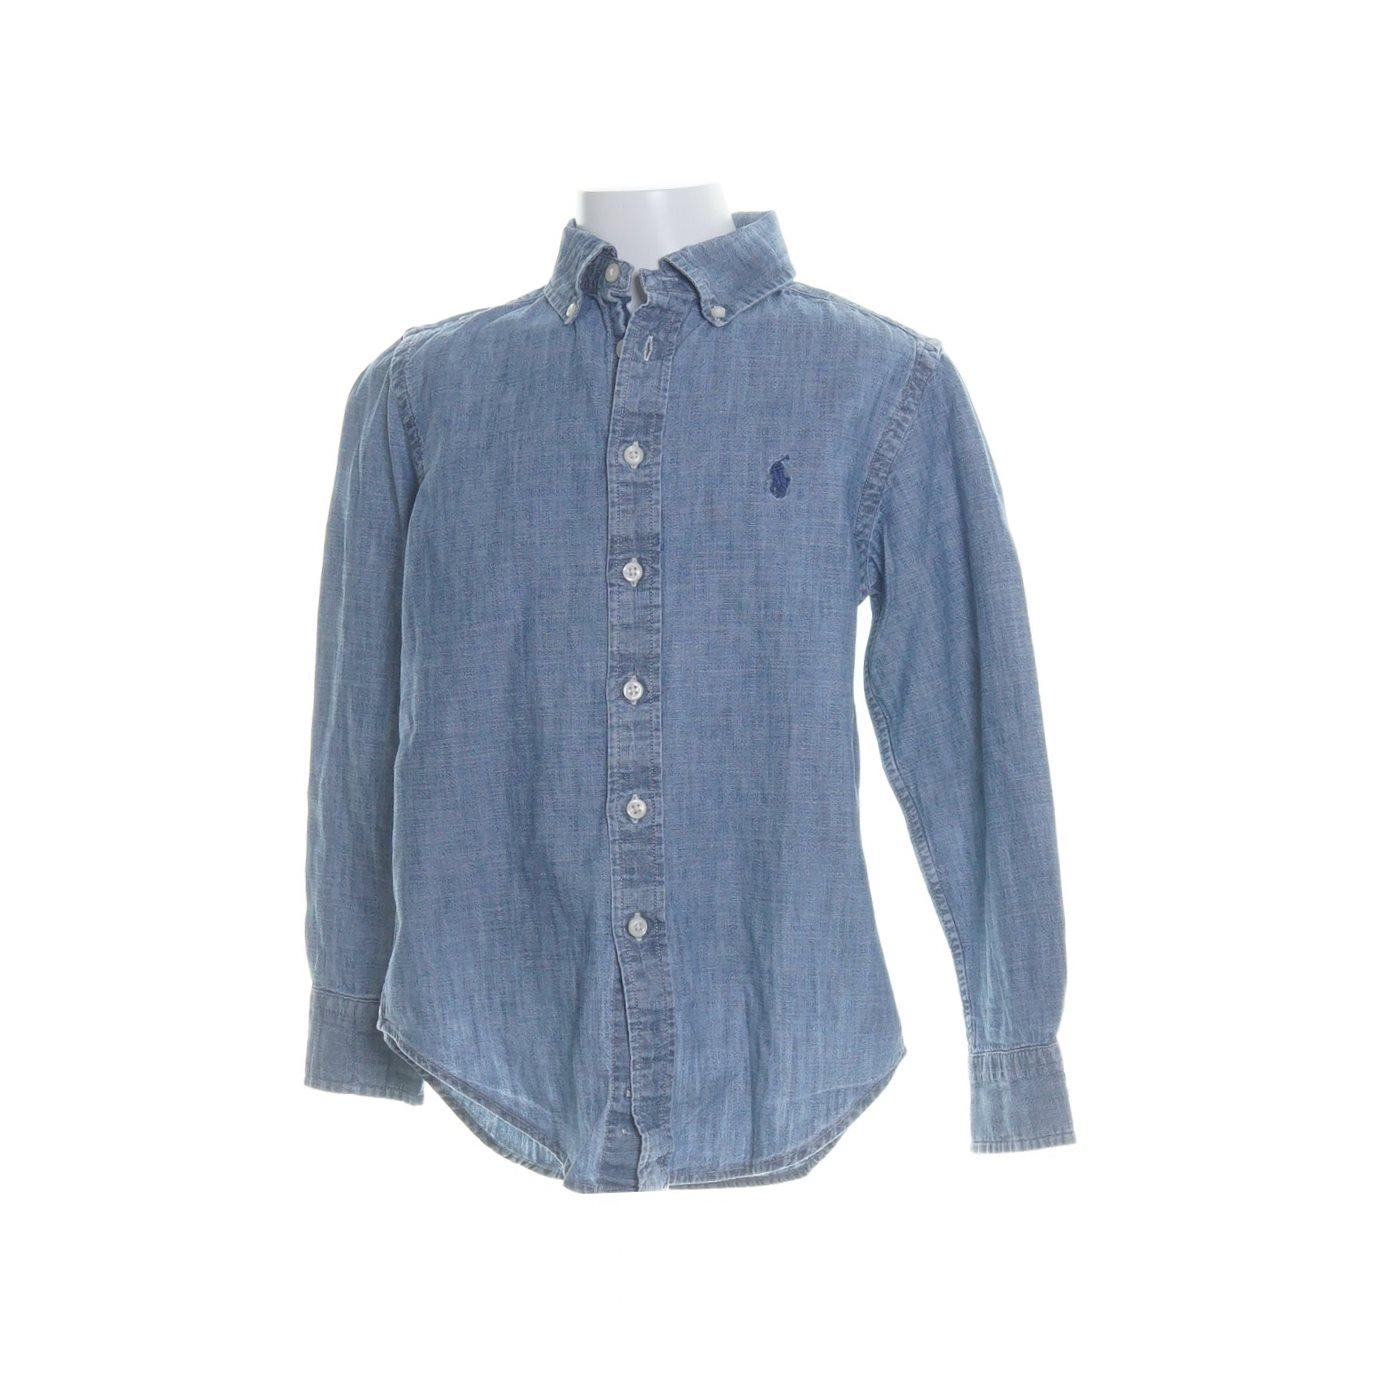 polo ralph lauren jeansskjorta